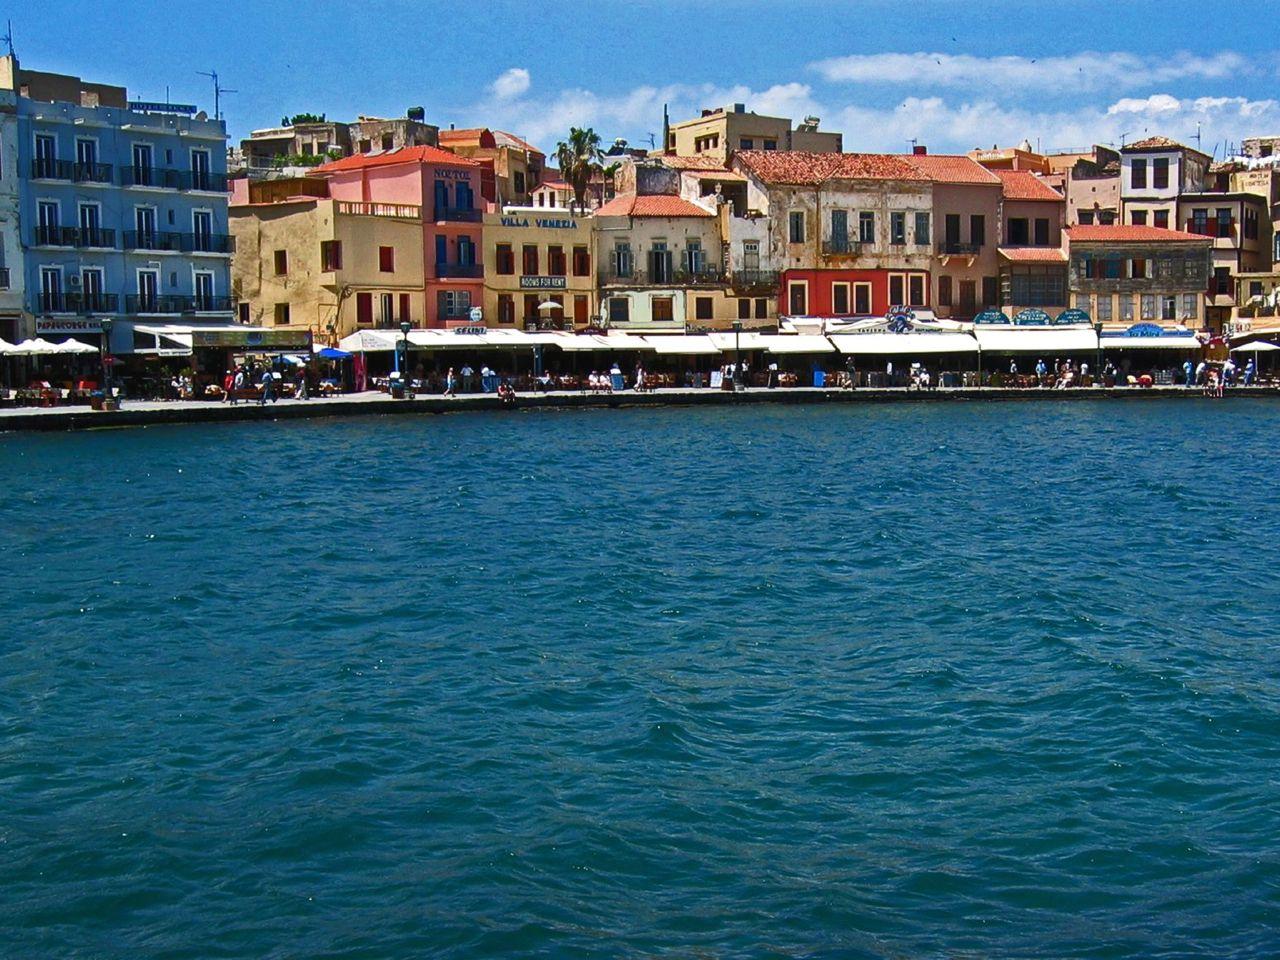 #Winter Package For Short Break In #Chania - #Crete http://www.cretetravel.com/activity/winter-package-for-short-break-in-chania-crete/ #activities #Chania #Town #Authentic